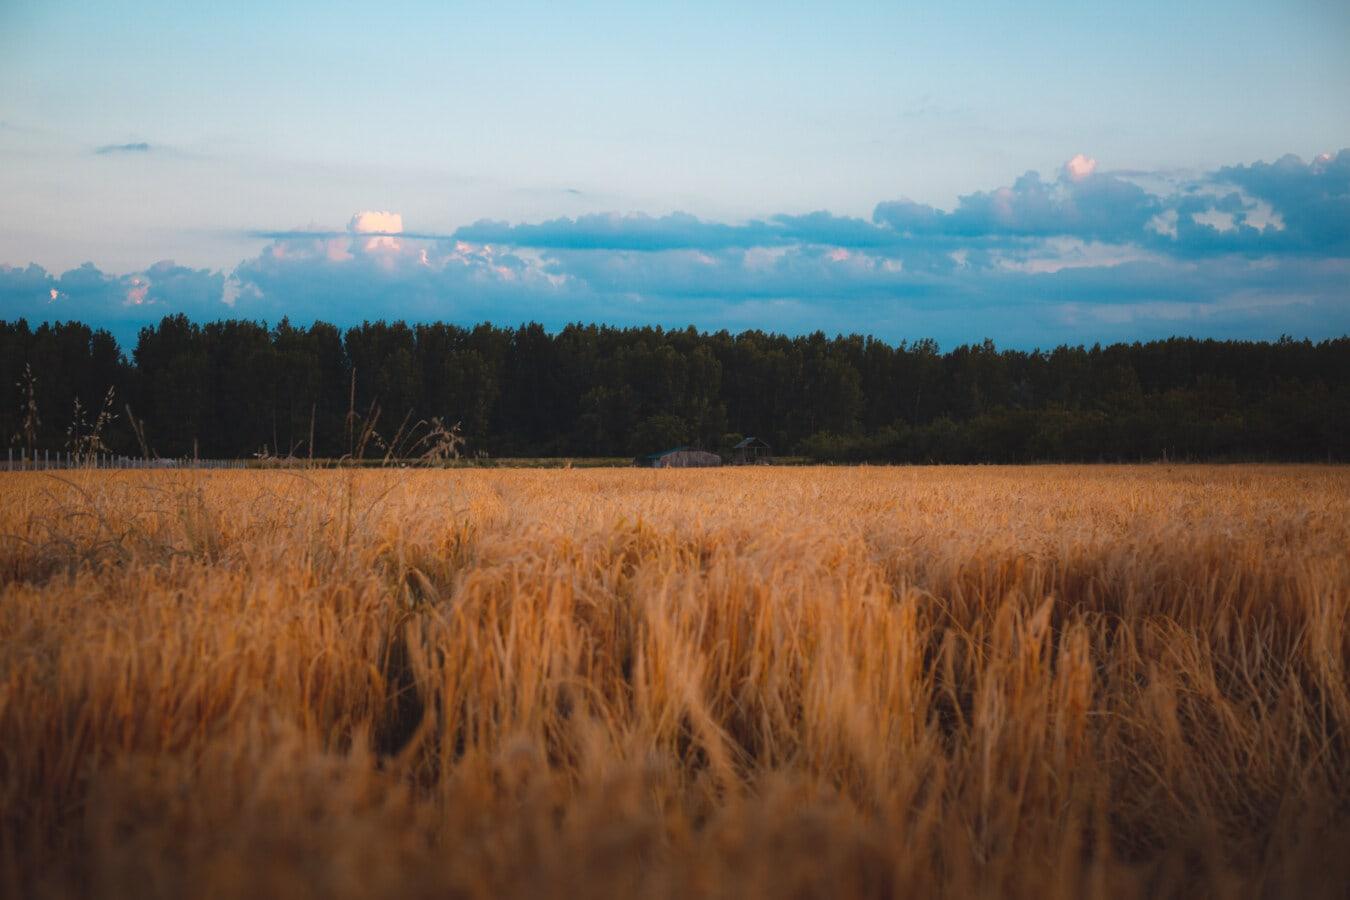 wheat, wheatfield, dusk, atmosphere, calm, field, dawn, rural, sunset, landscape